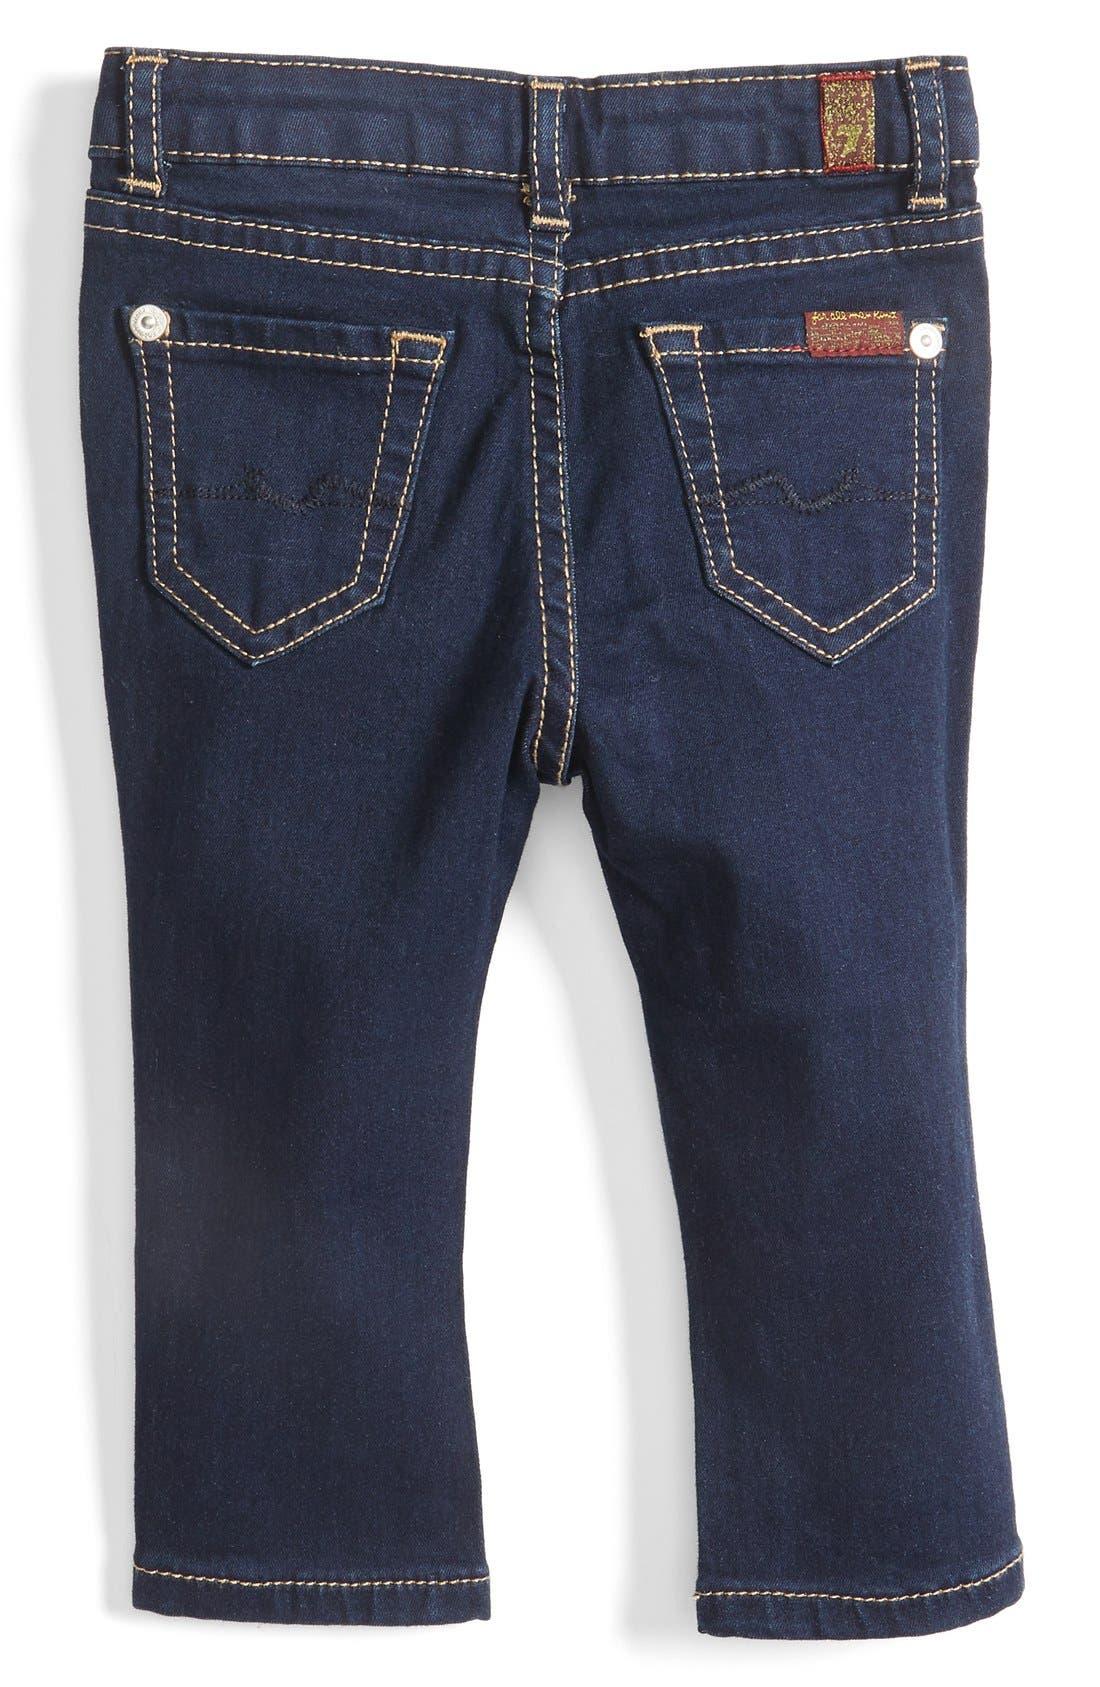 Skinny Fit Jeans,                             Alternate thumbnail 2, color,                             407